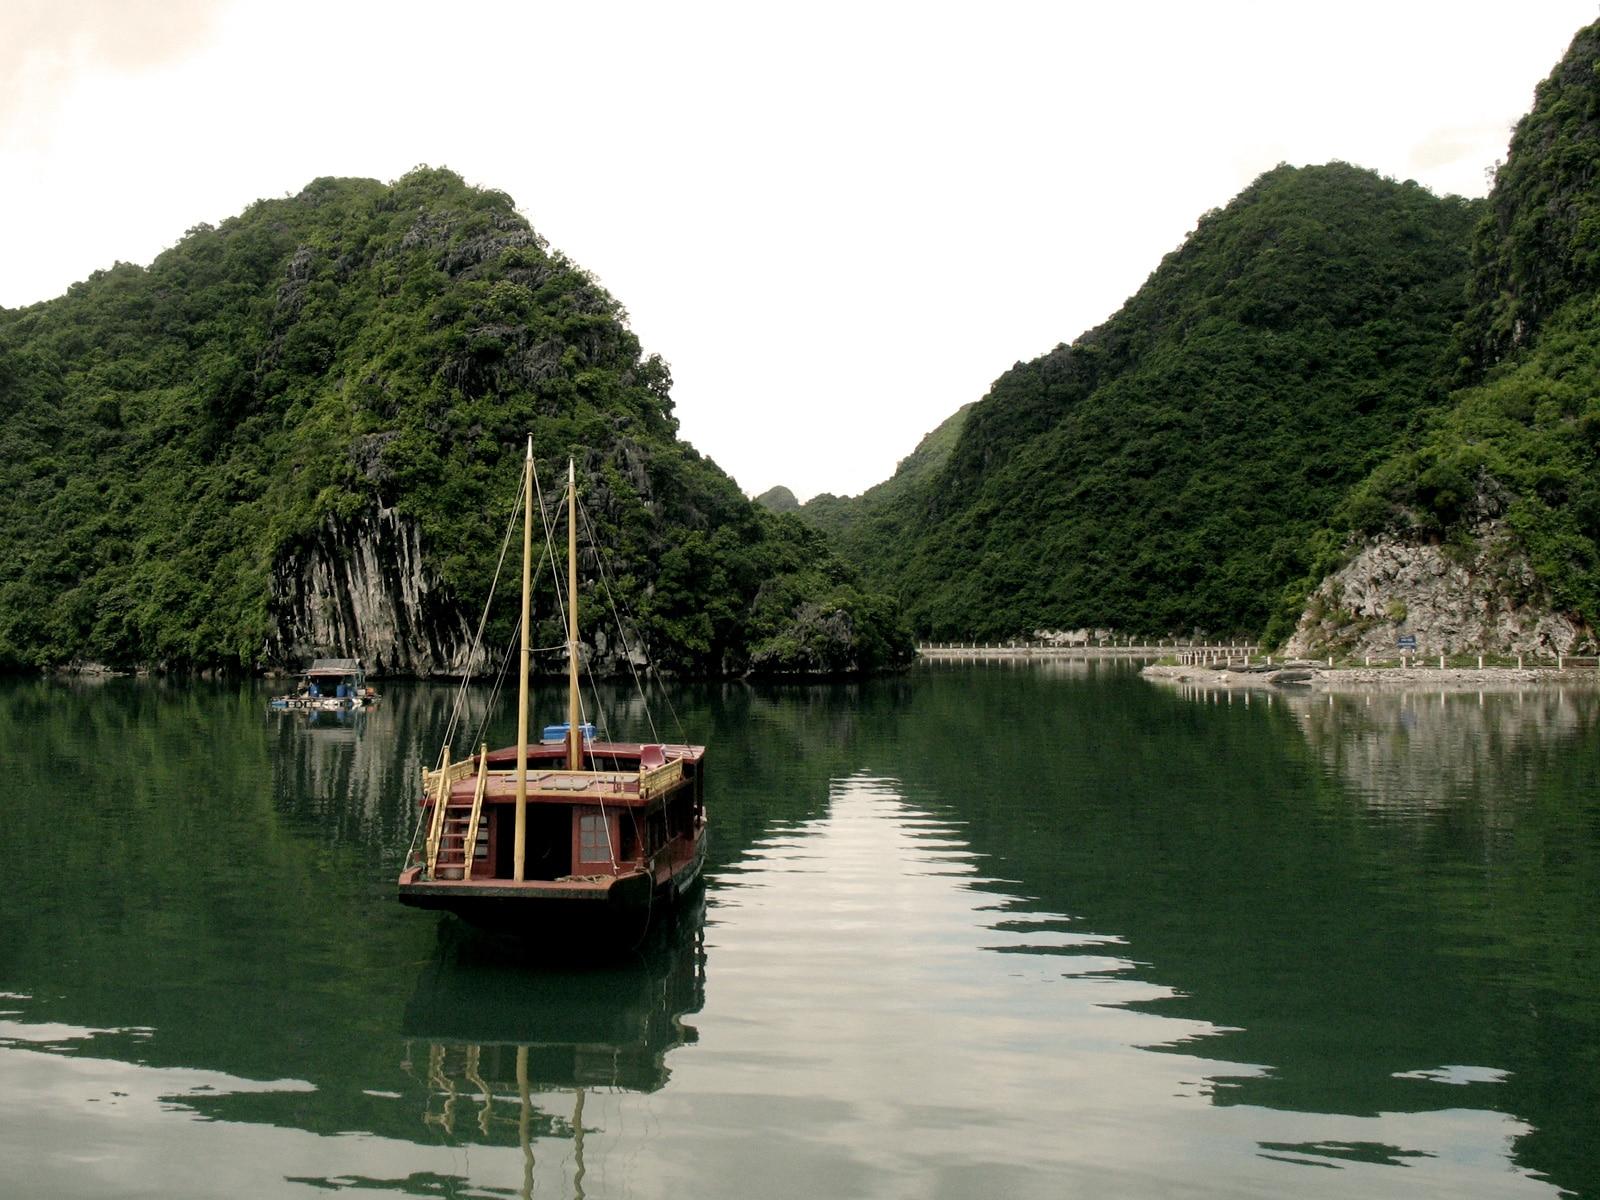 River View of Cat Ba National Park Vietnam